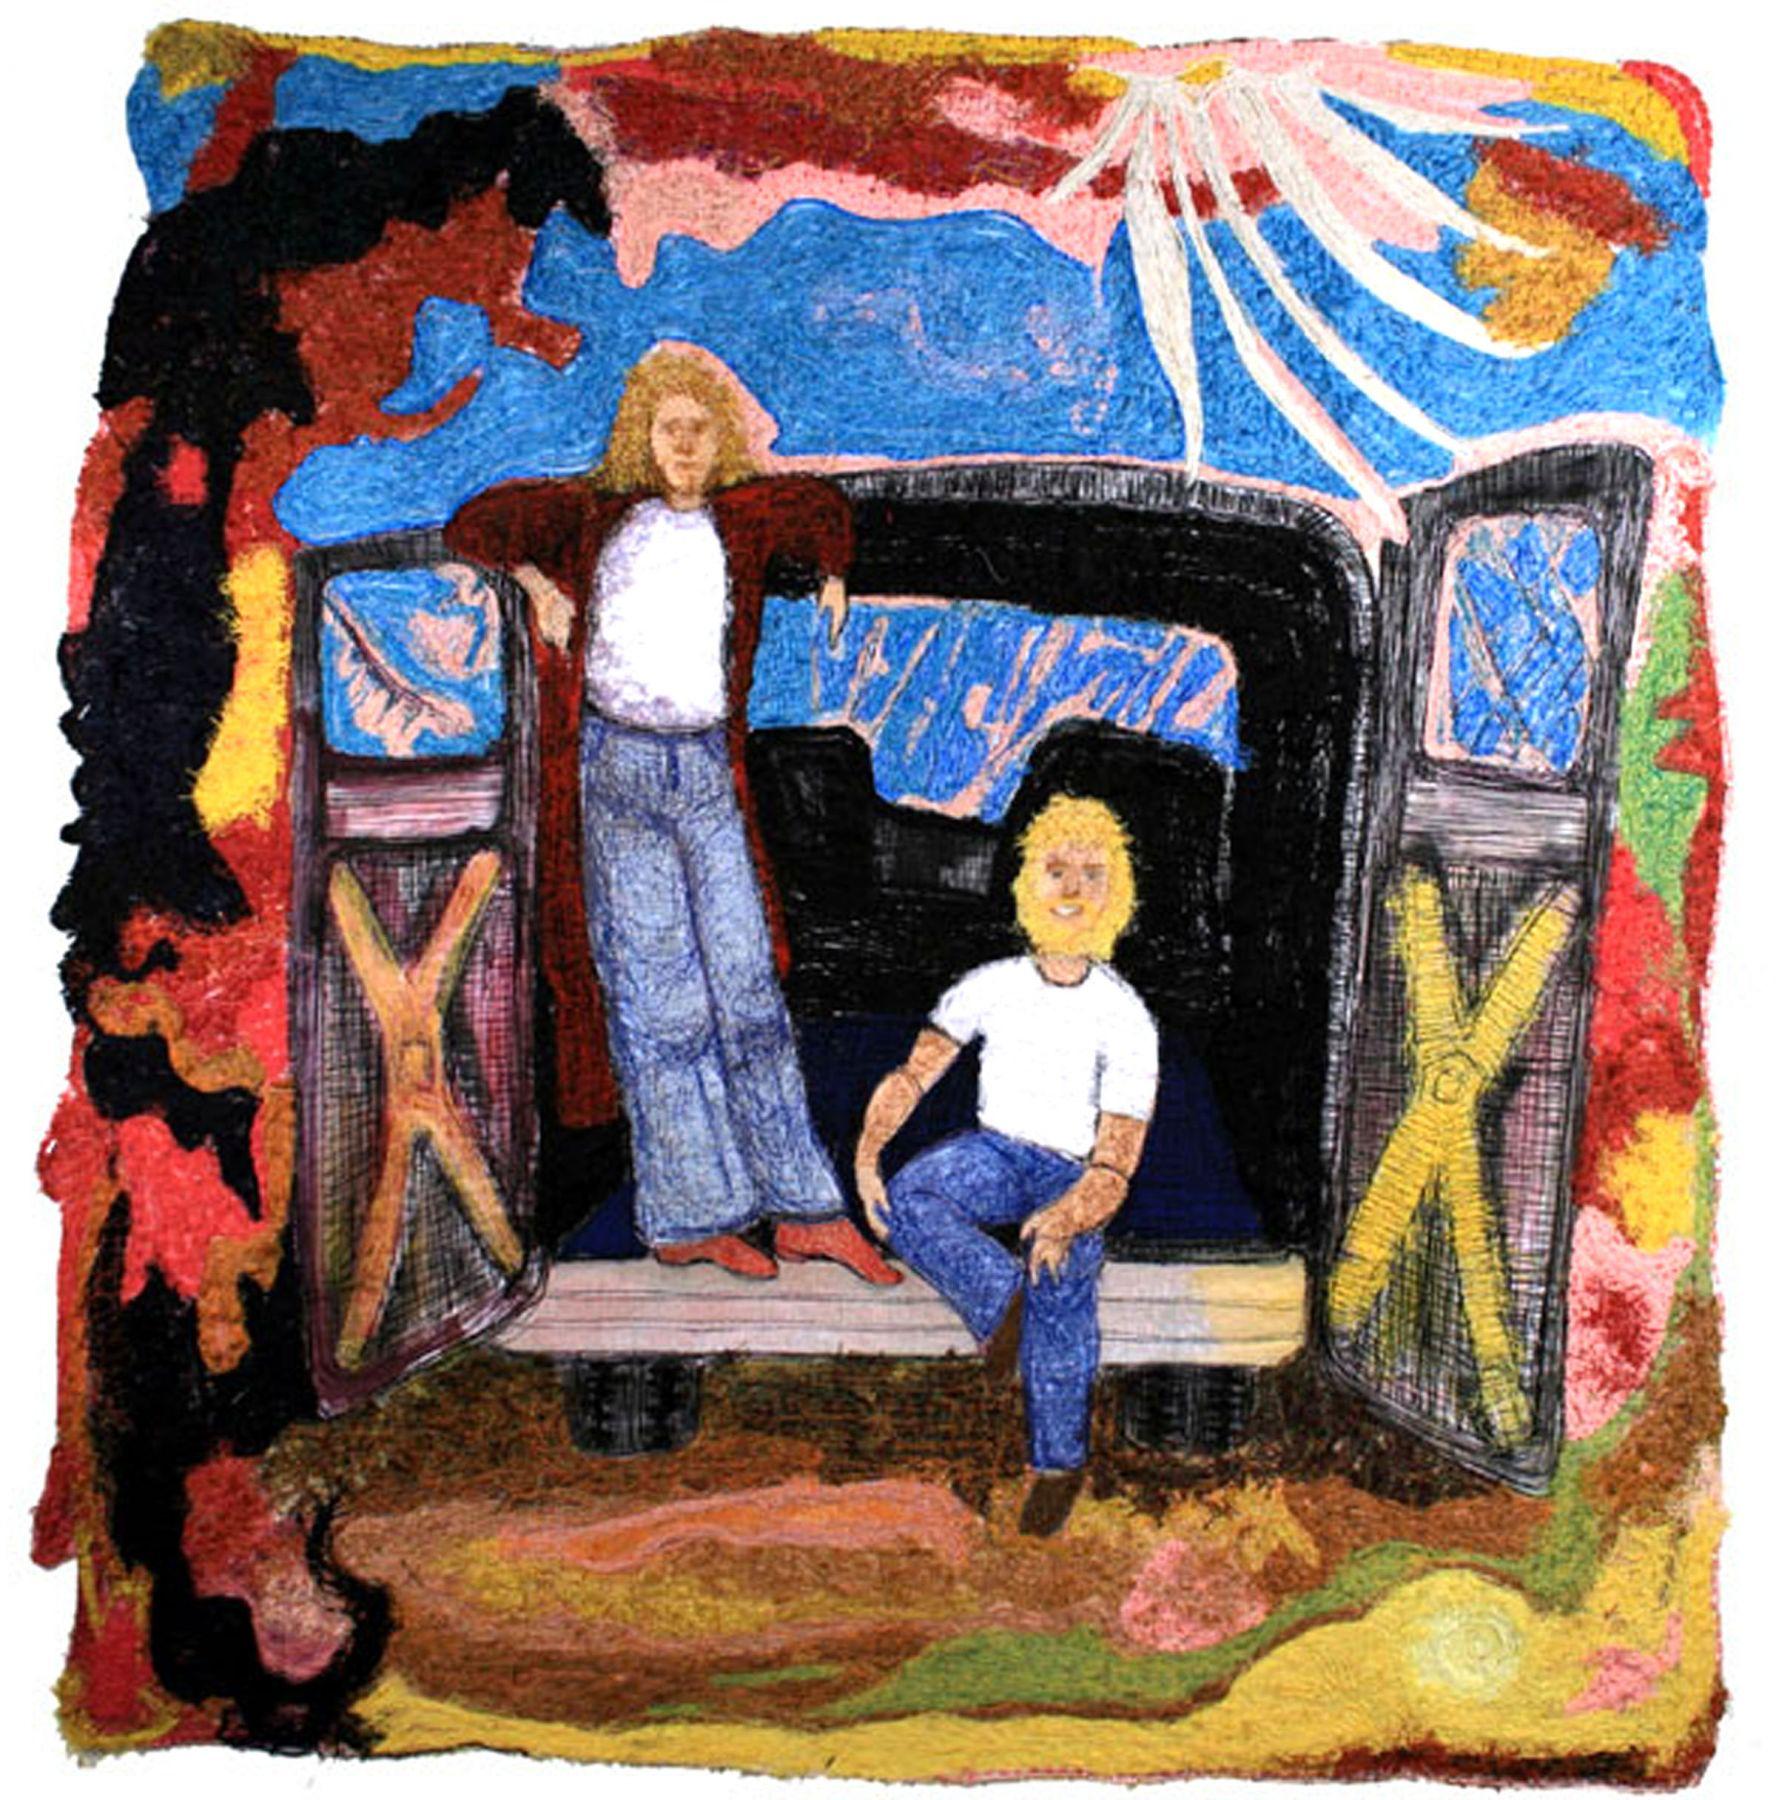 GINA PHILLIPS Coversion Van, 2008